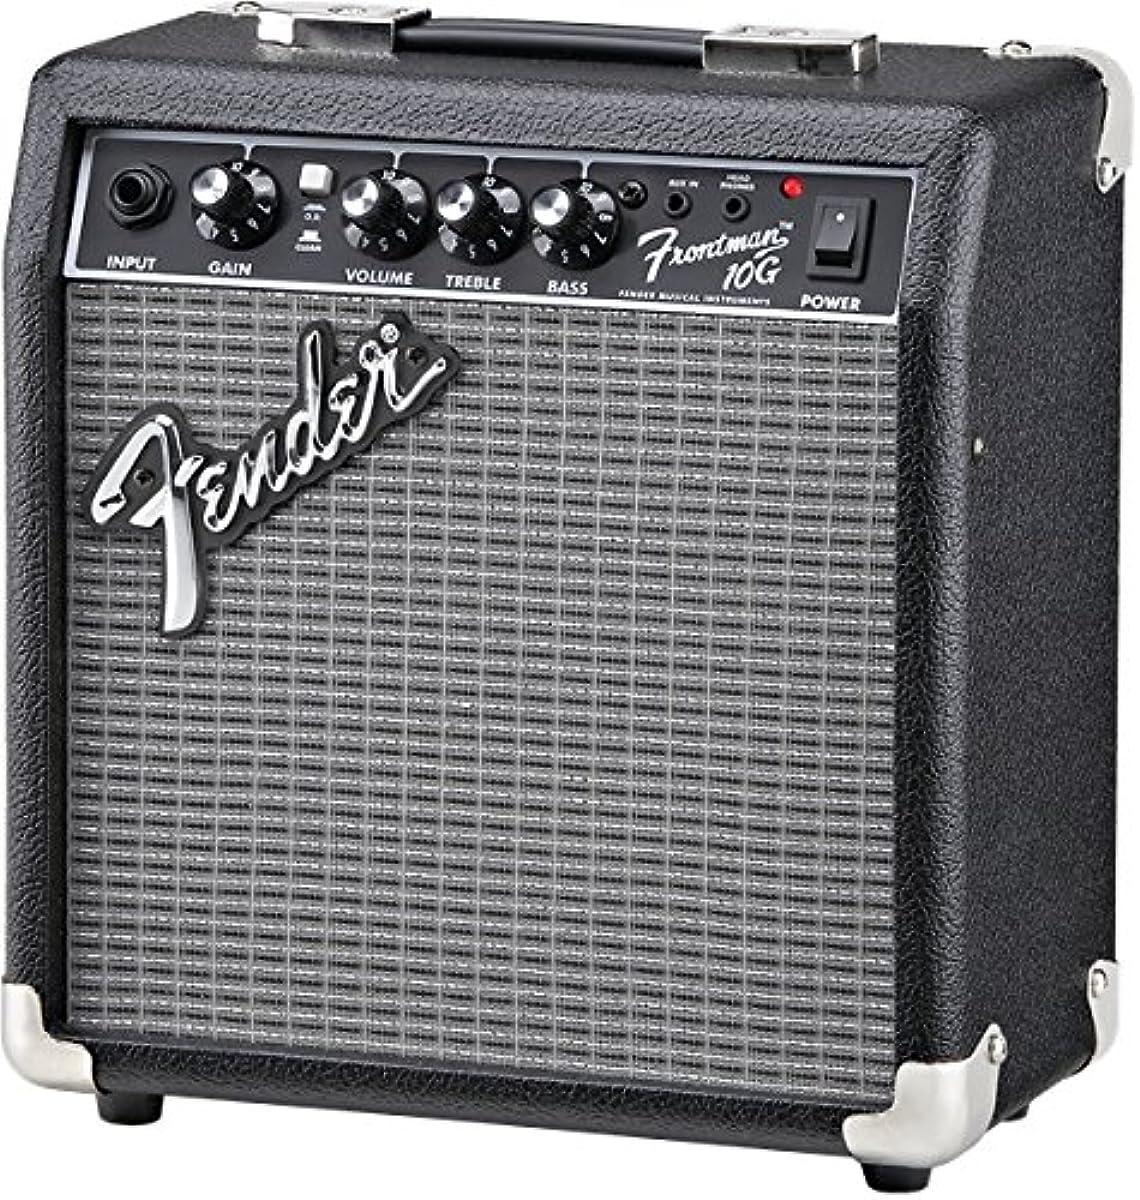 fender frontman 10g electric guitar amplifier amp 10 watts free shipping ebay. Black Bedroom Furniture Sets. Home Design Ideas